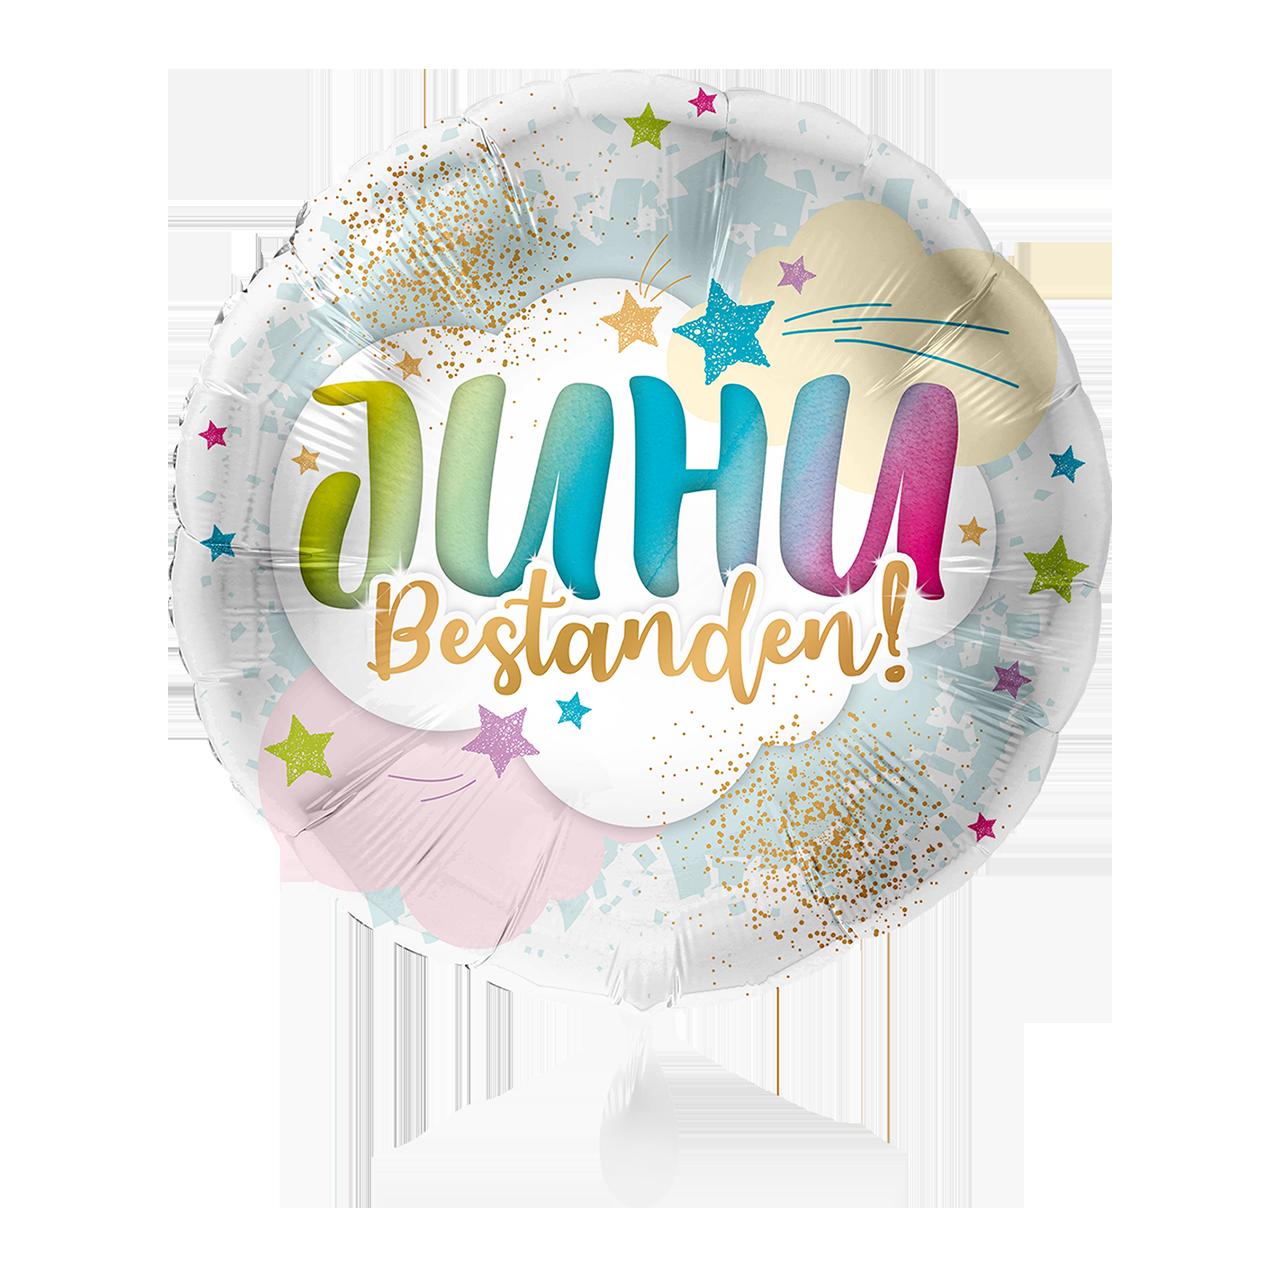 JUHU Bestanden! Folienballon